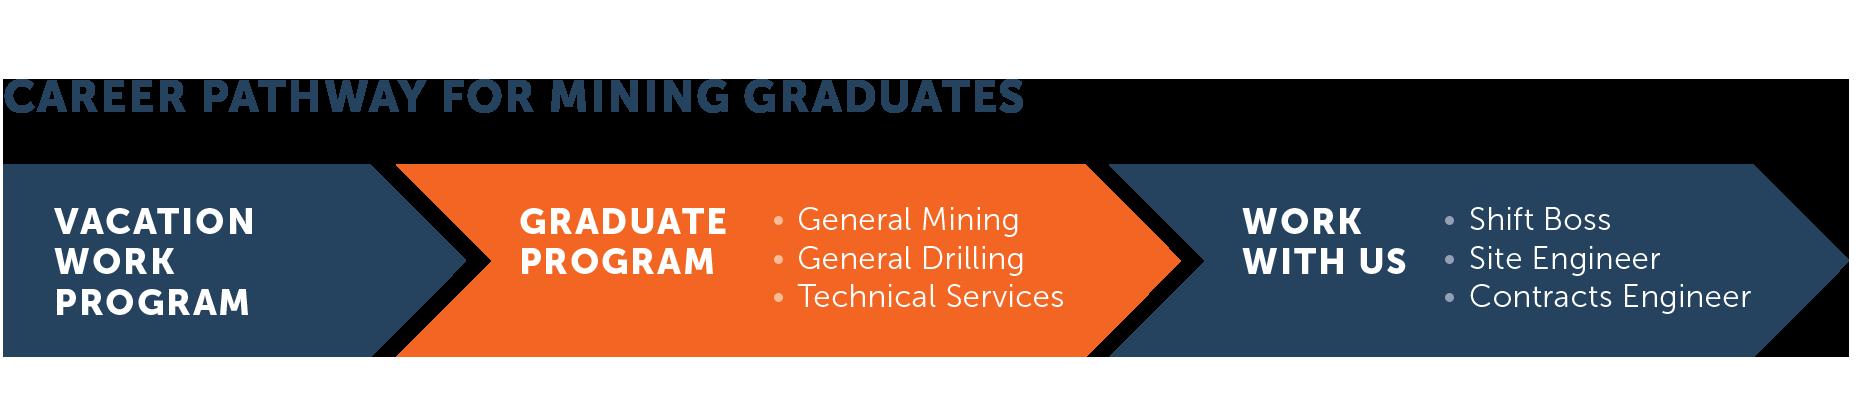 Graduate Program • Barminco R GradProgram 1 Diagram 1